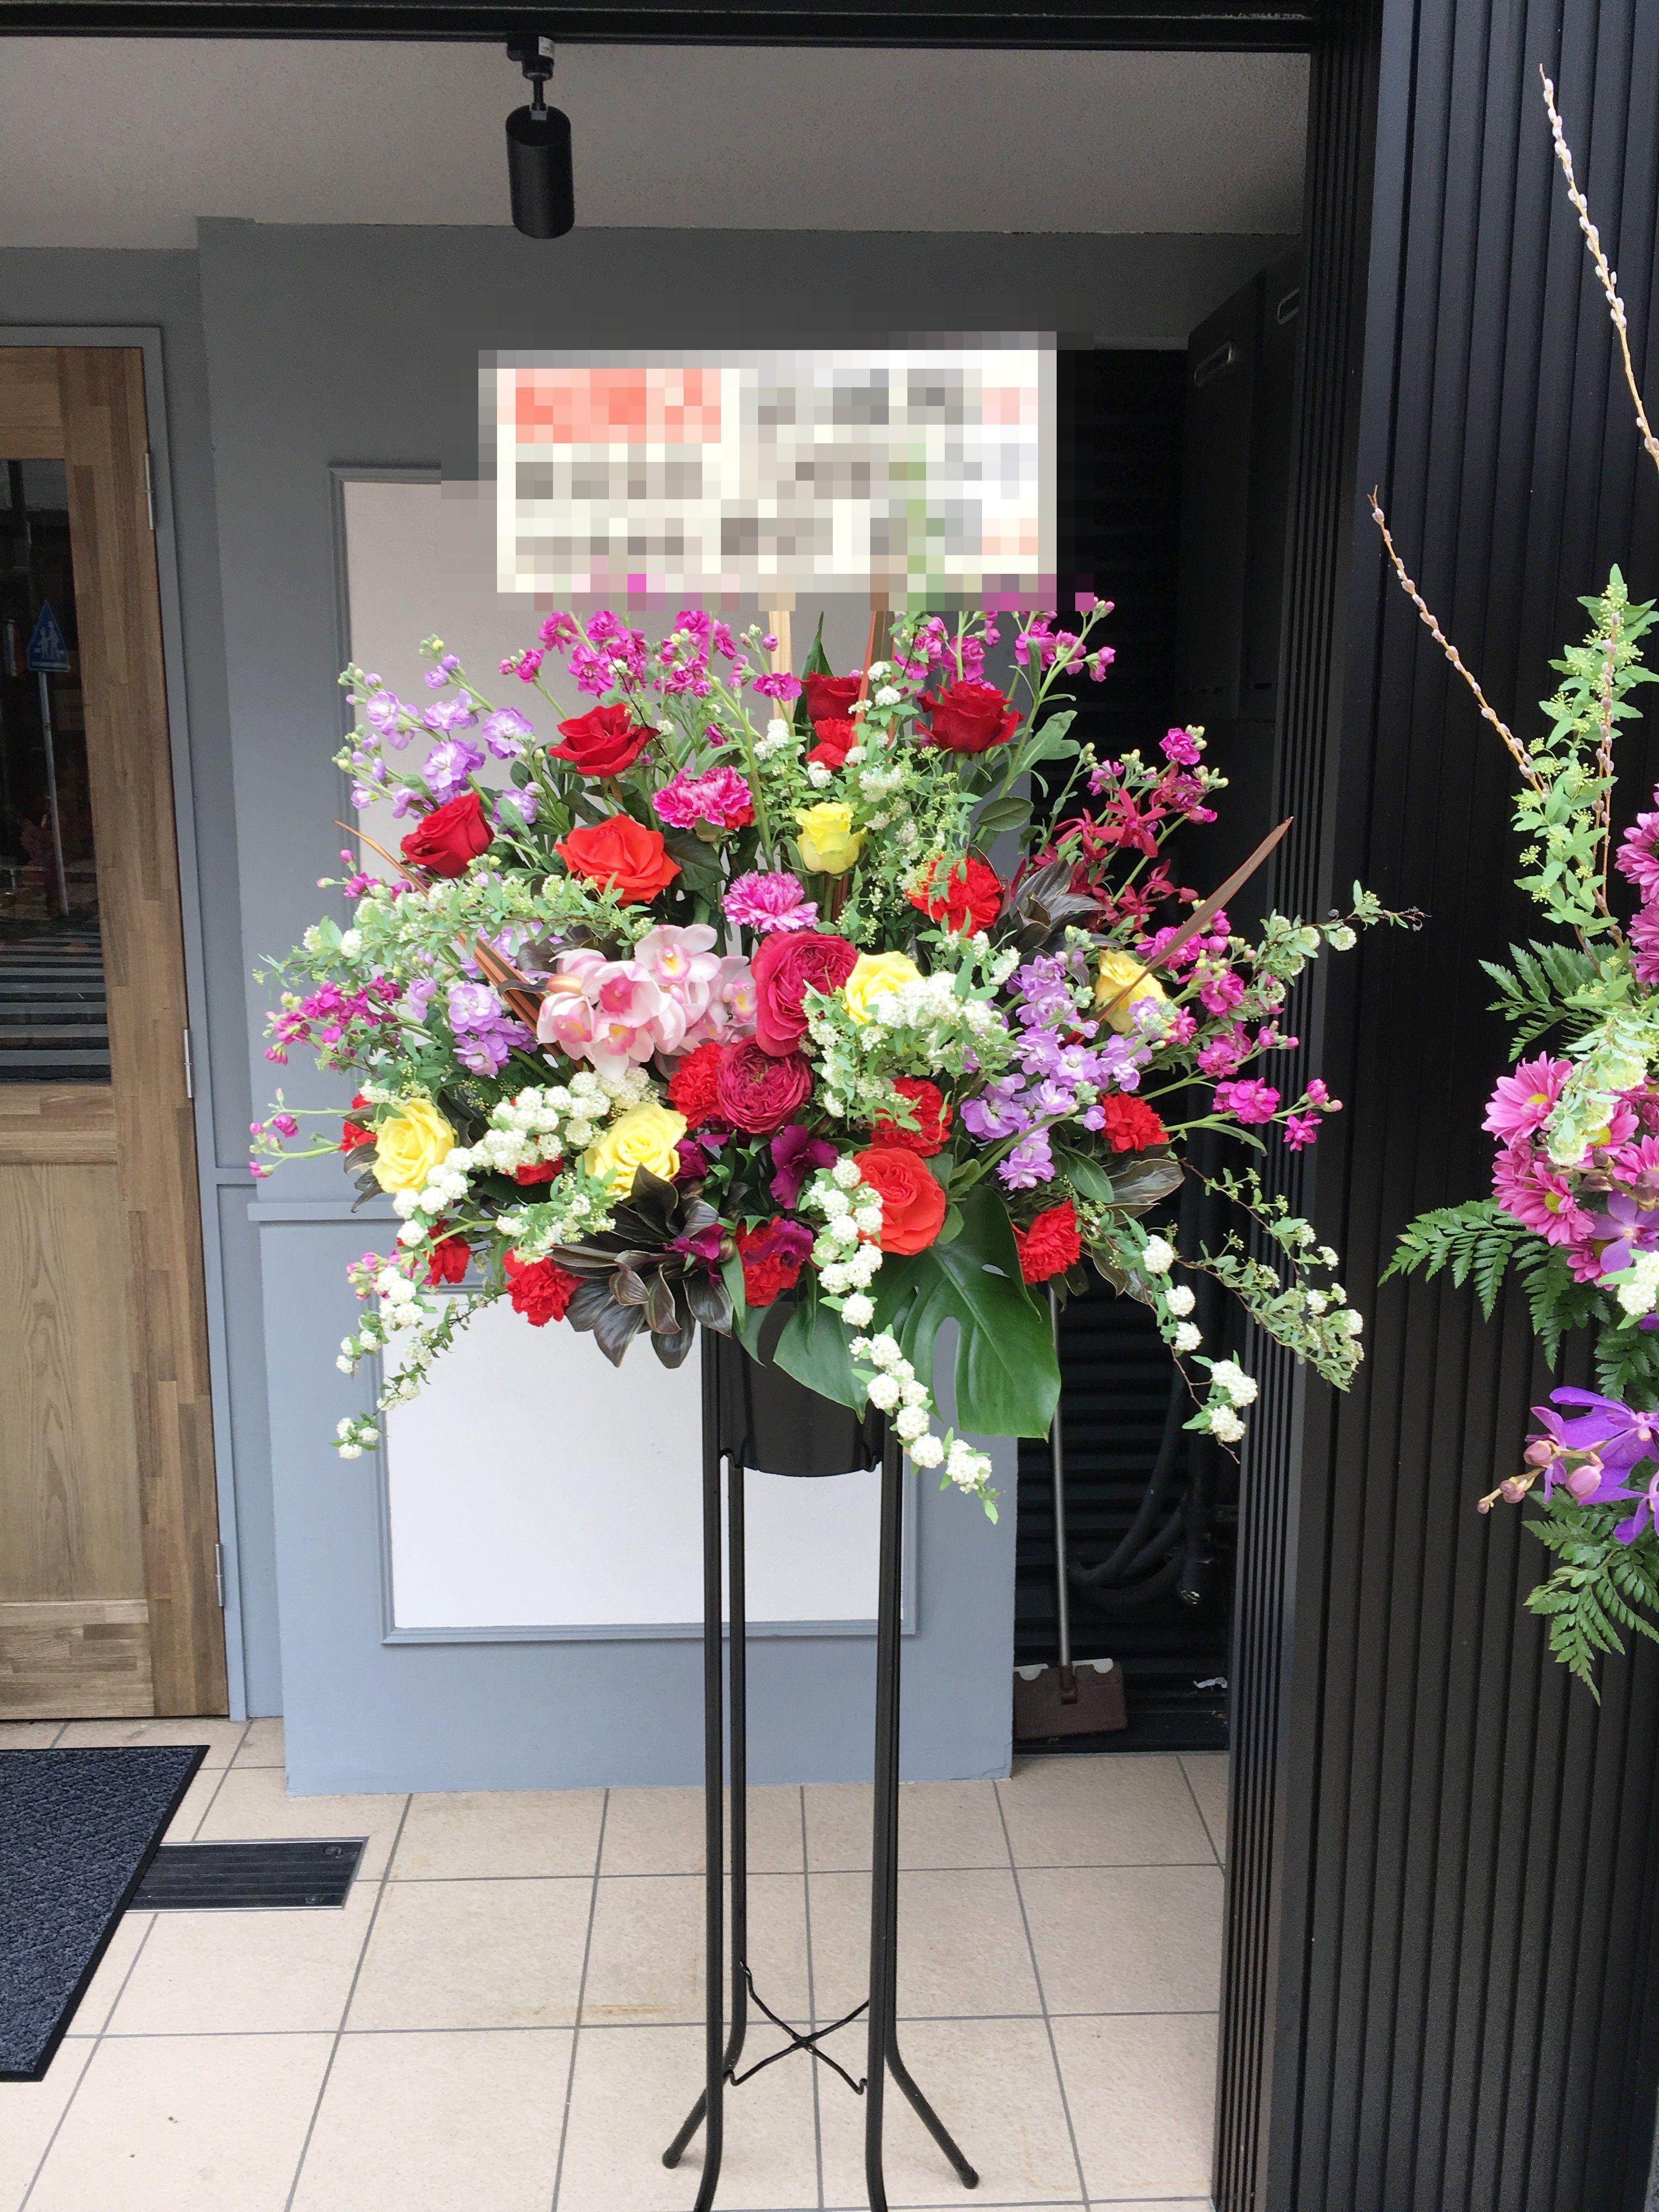 F.A.D横浜へ花束を即日当日配達しました!【横浜花屋の花束・スタンド花・胡蝶蘭・バルーン・アレンジメント配達事例278】